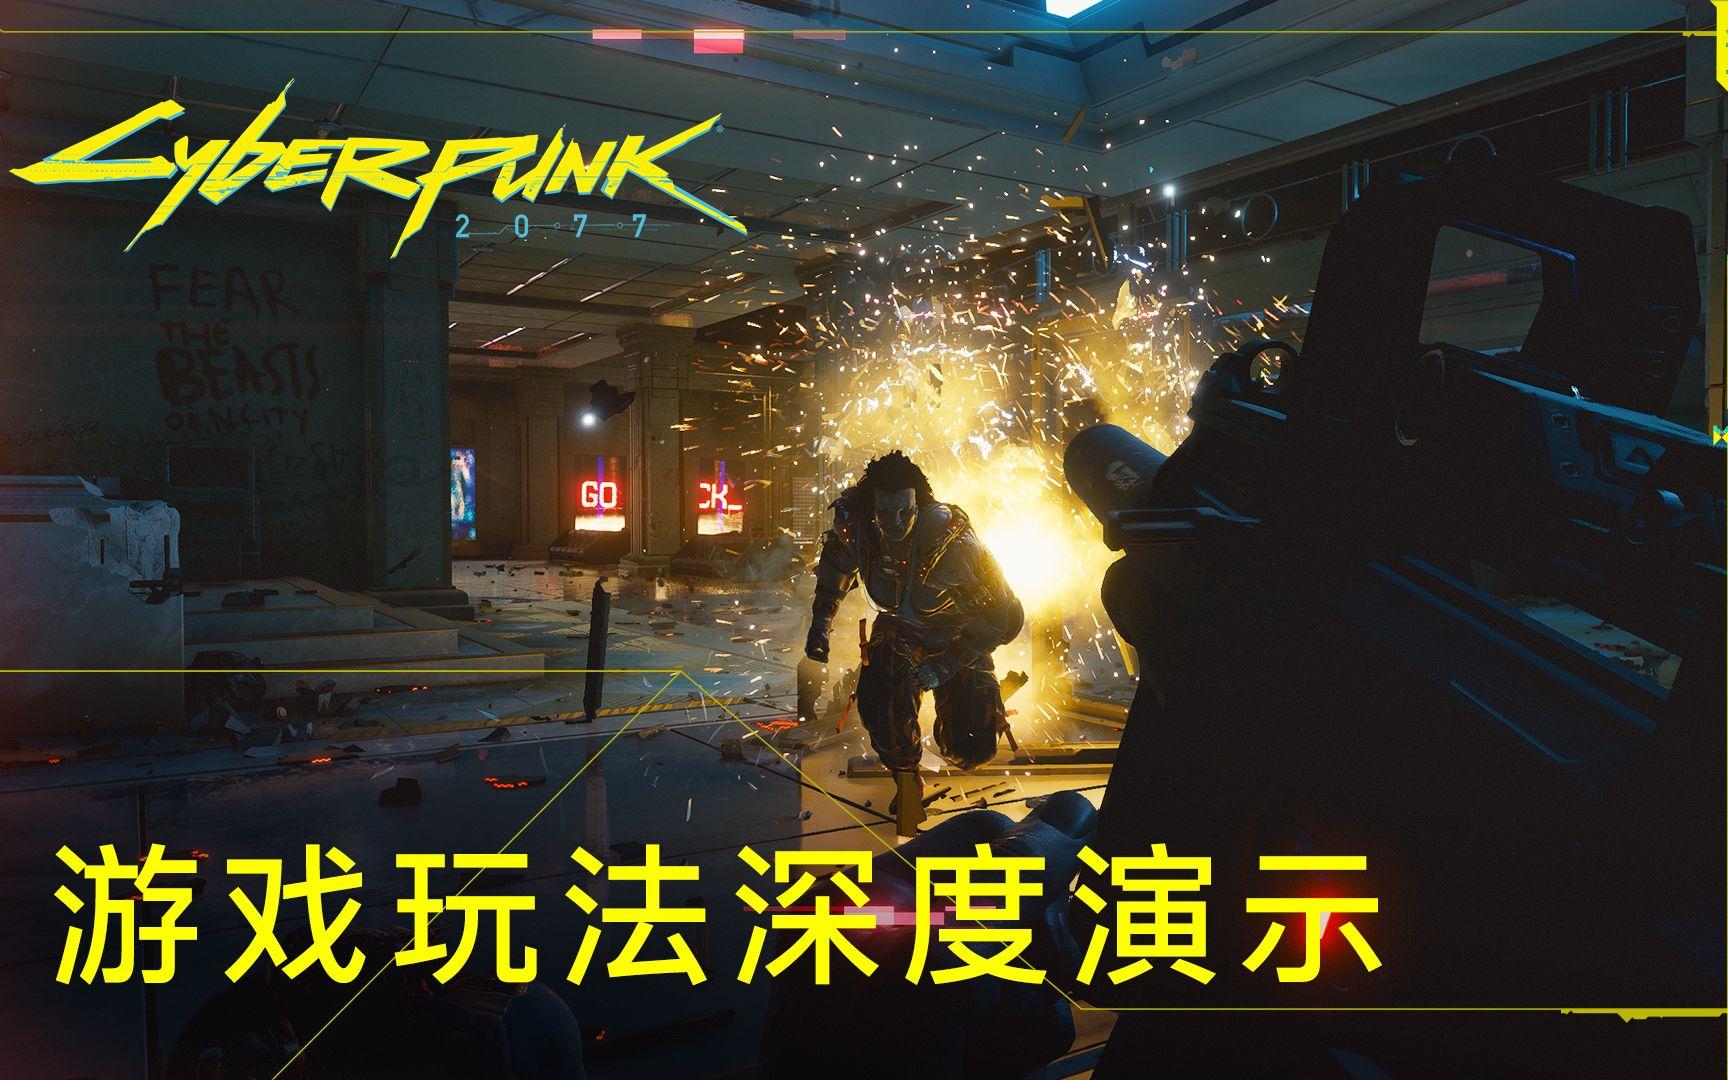 CD Projekt Red公佈了《電馭叛客2077》的中文配音試玩演示影像 9aec770ef1fbb7d2b1f9f7cc318057fe1da33f0a